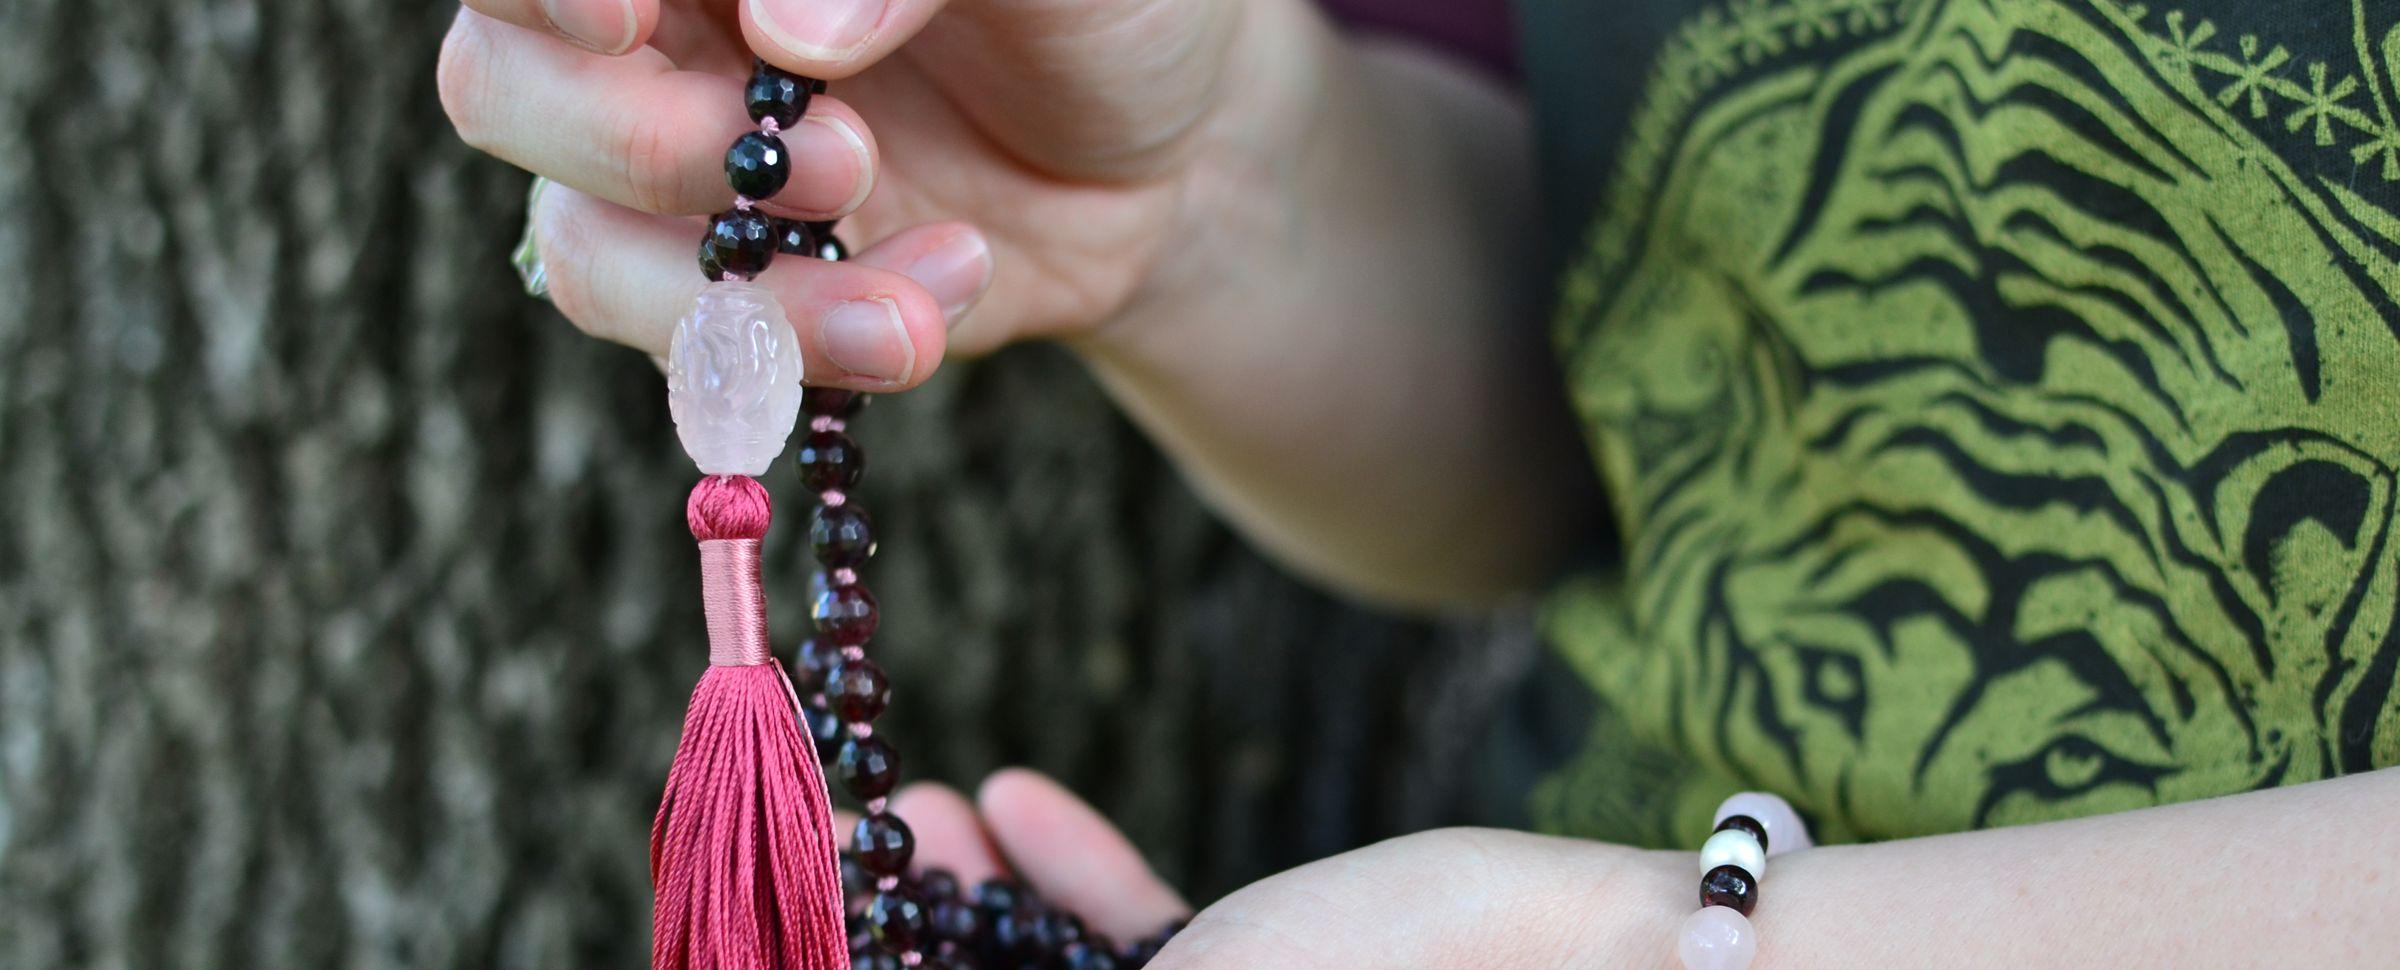 Quality Malas & Jewelry - mala meditation banner